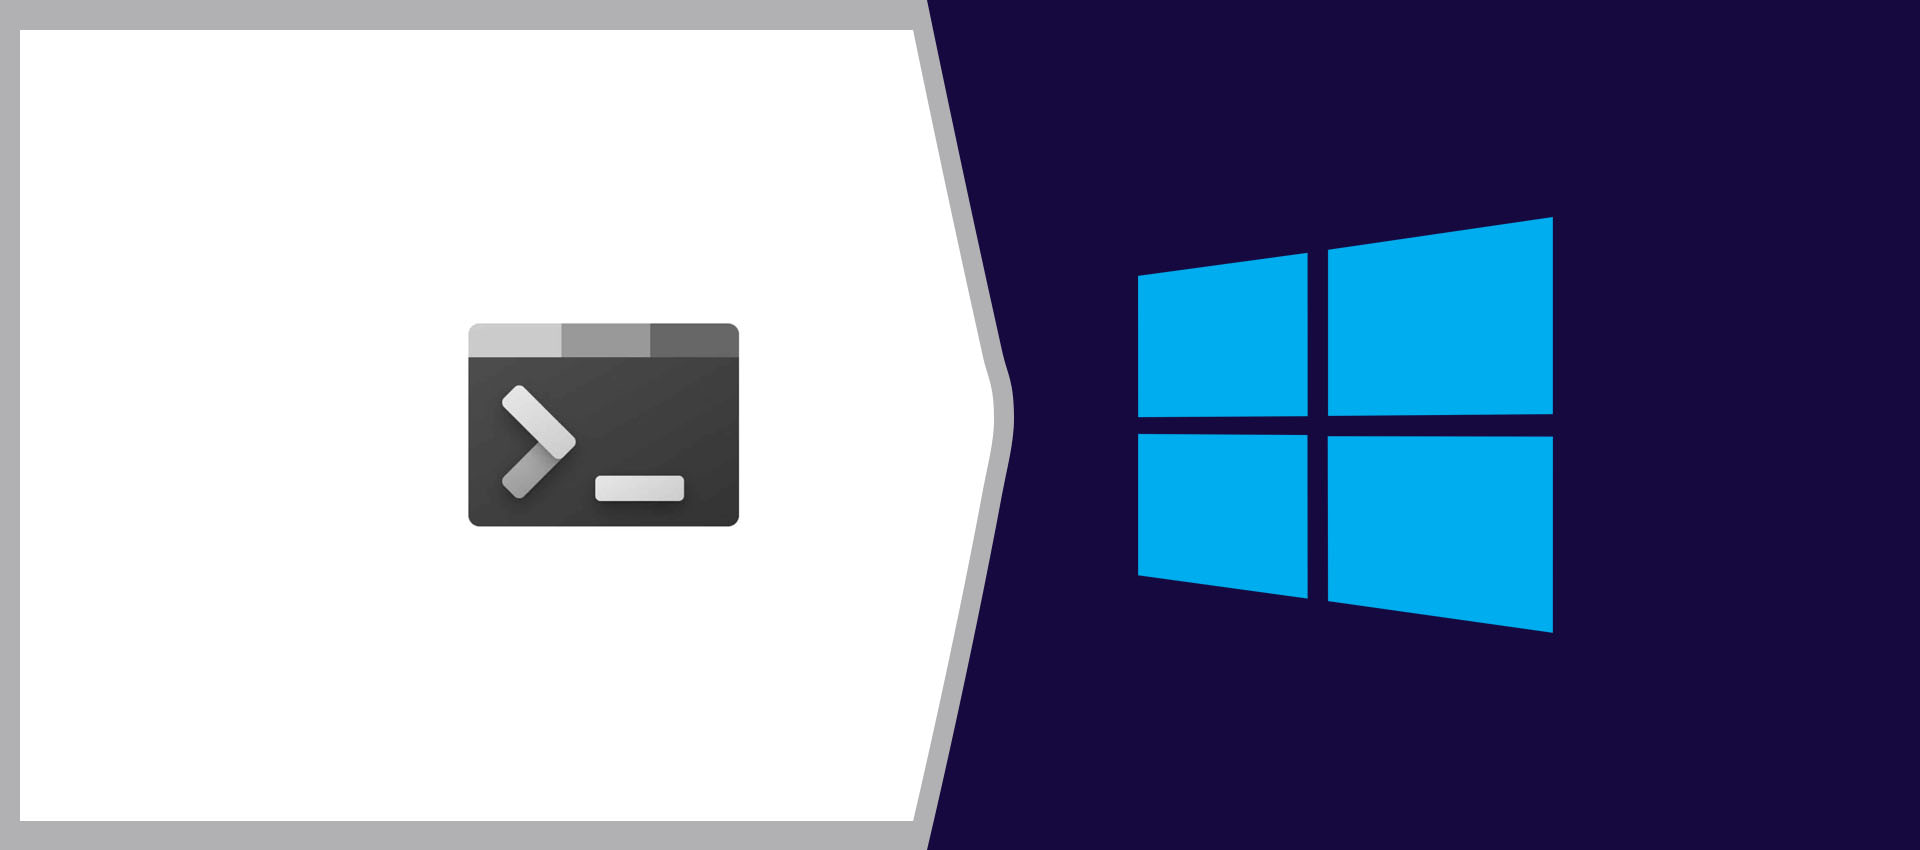 How To Install Windows Terminal on Windows 10